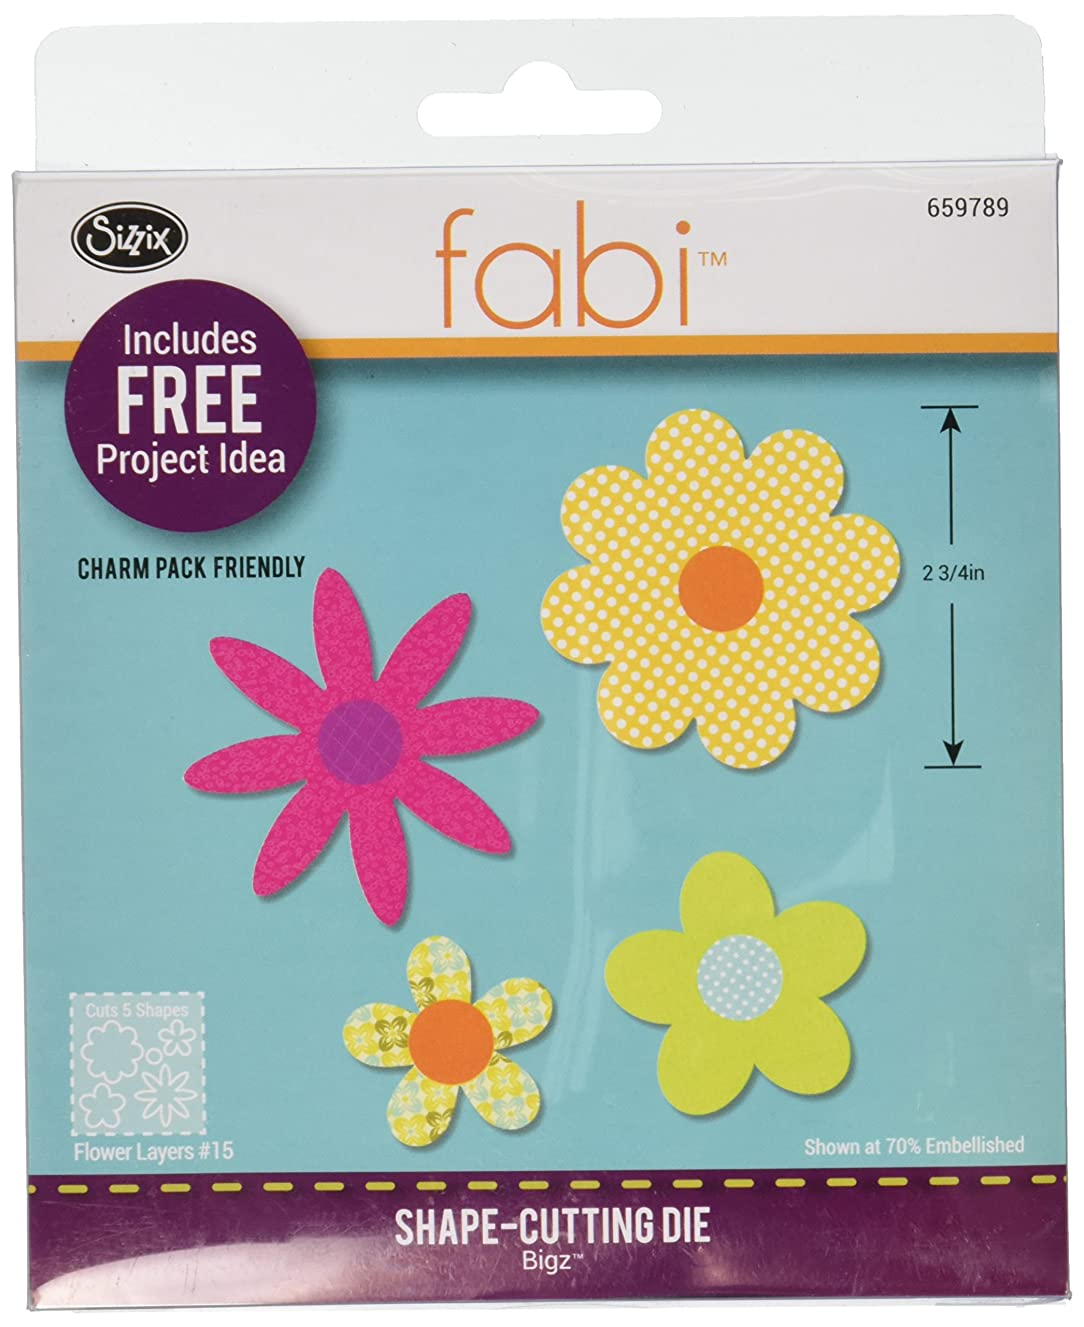 Sizzix Fabi Bigz, Flower Layers #15, Steel Rule Die